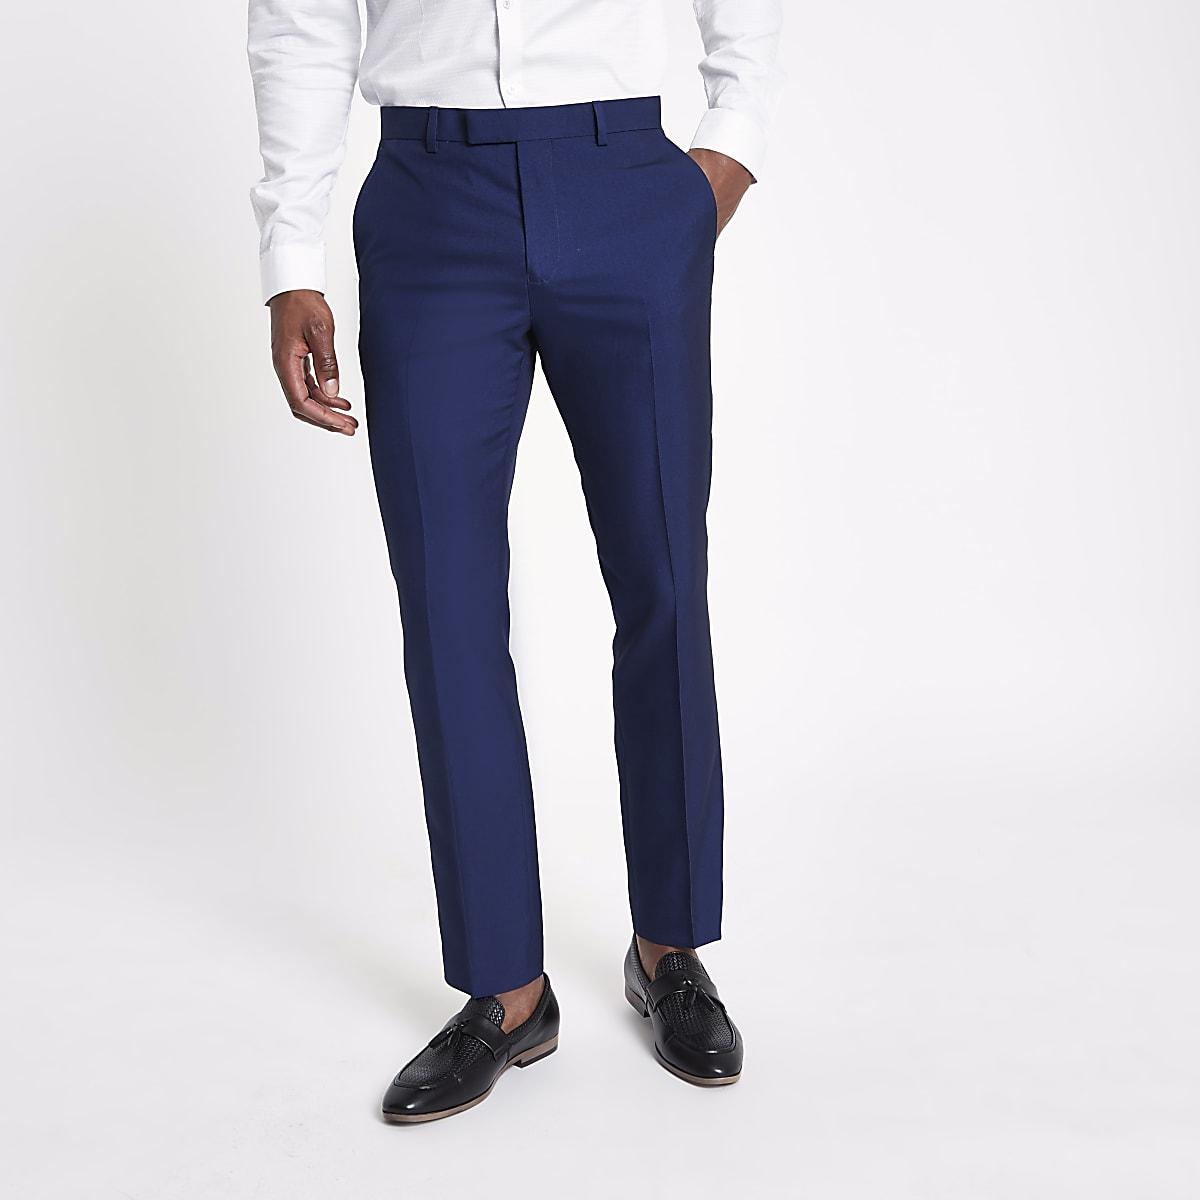 Lichtblauwe slim-fit pantalon